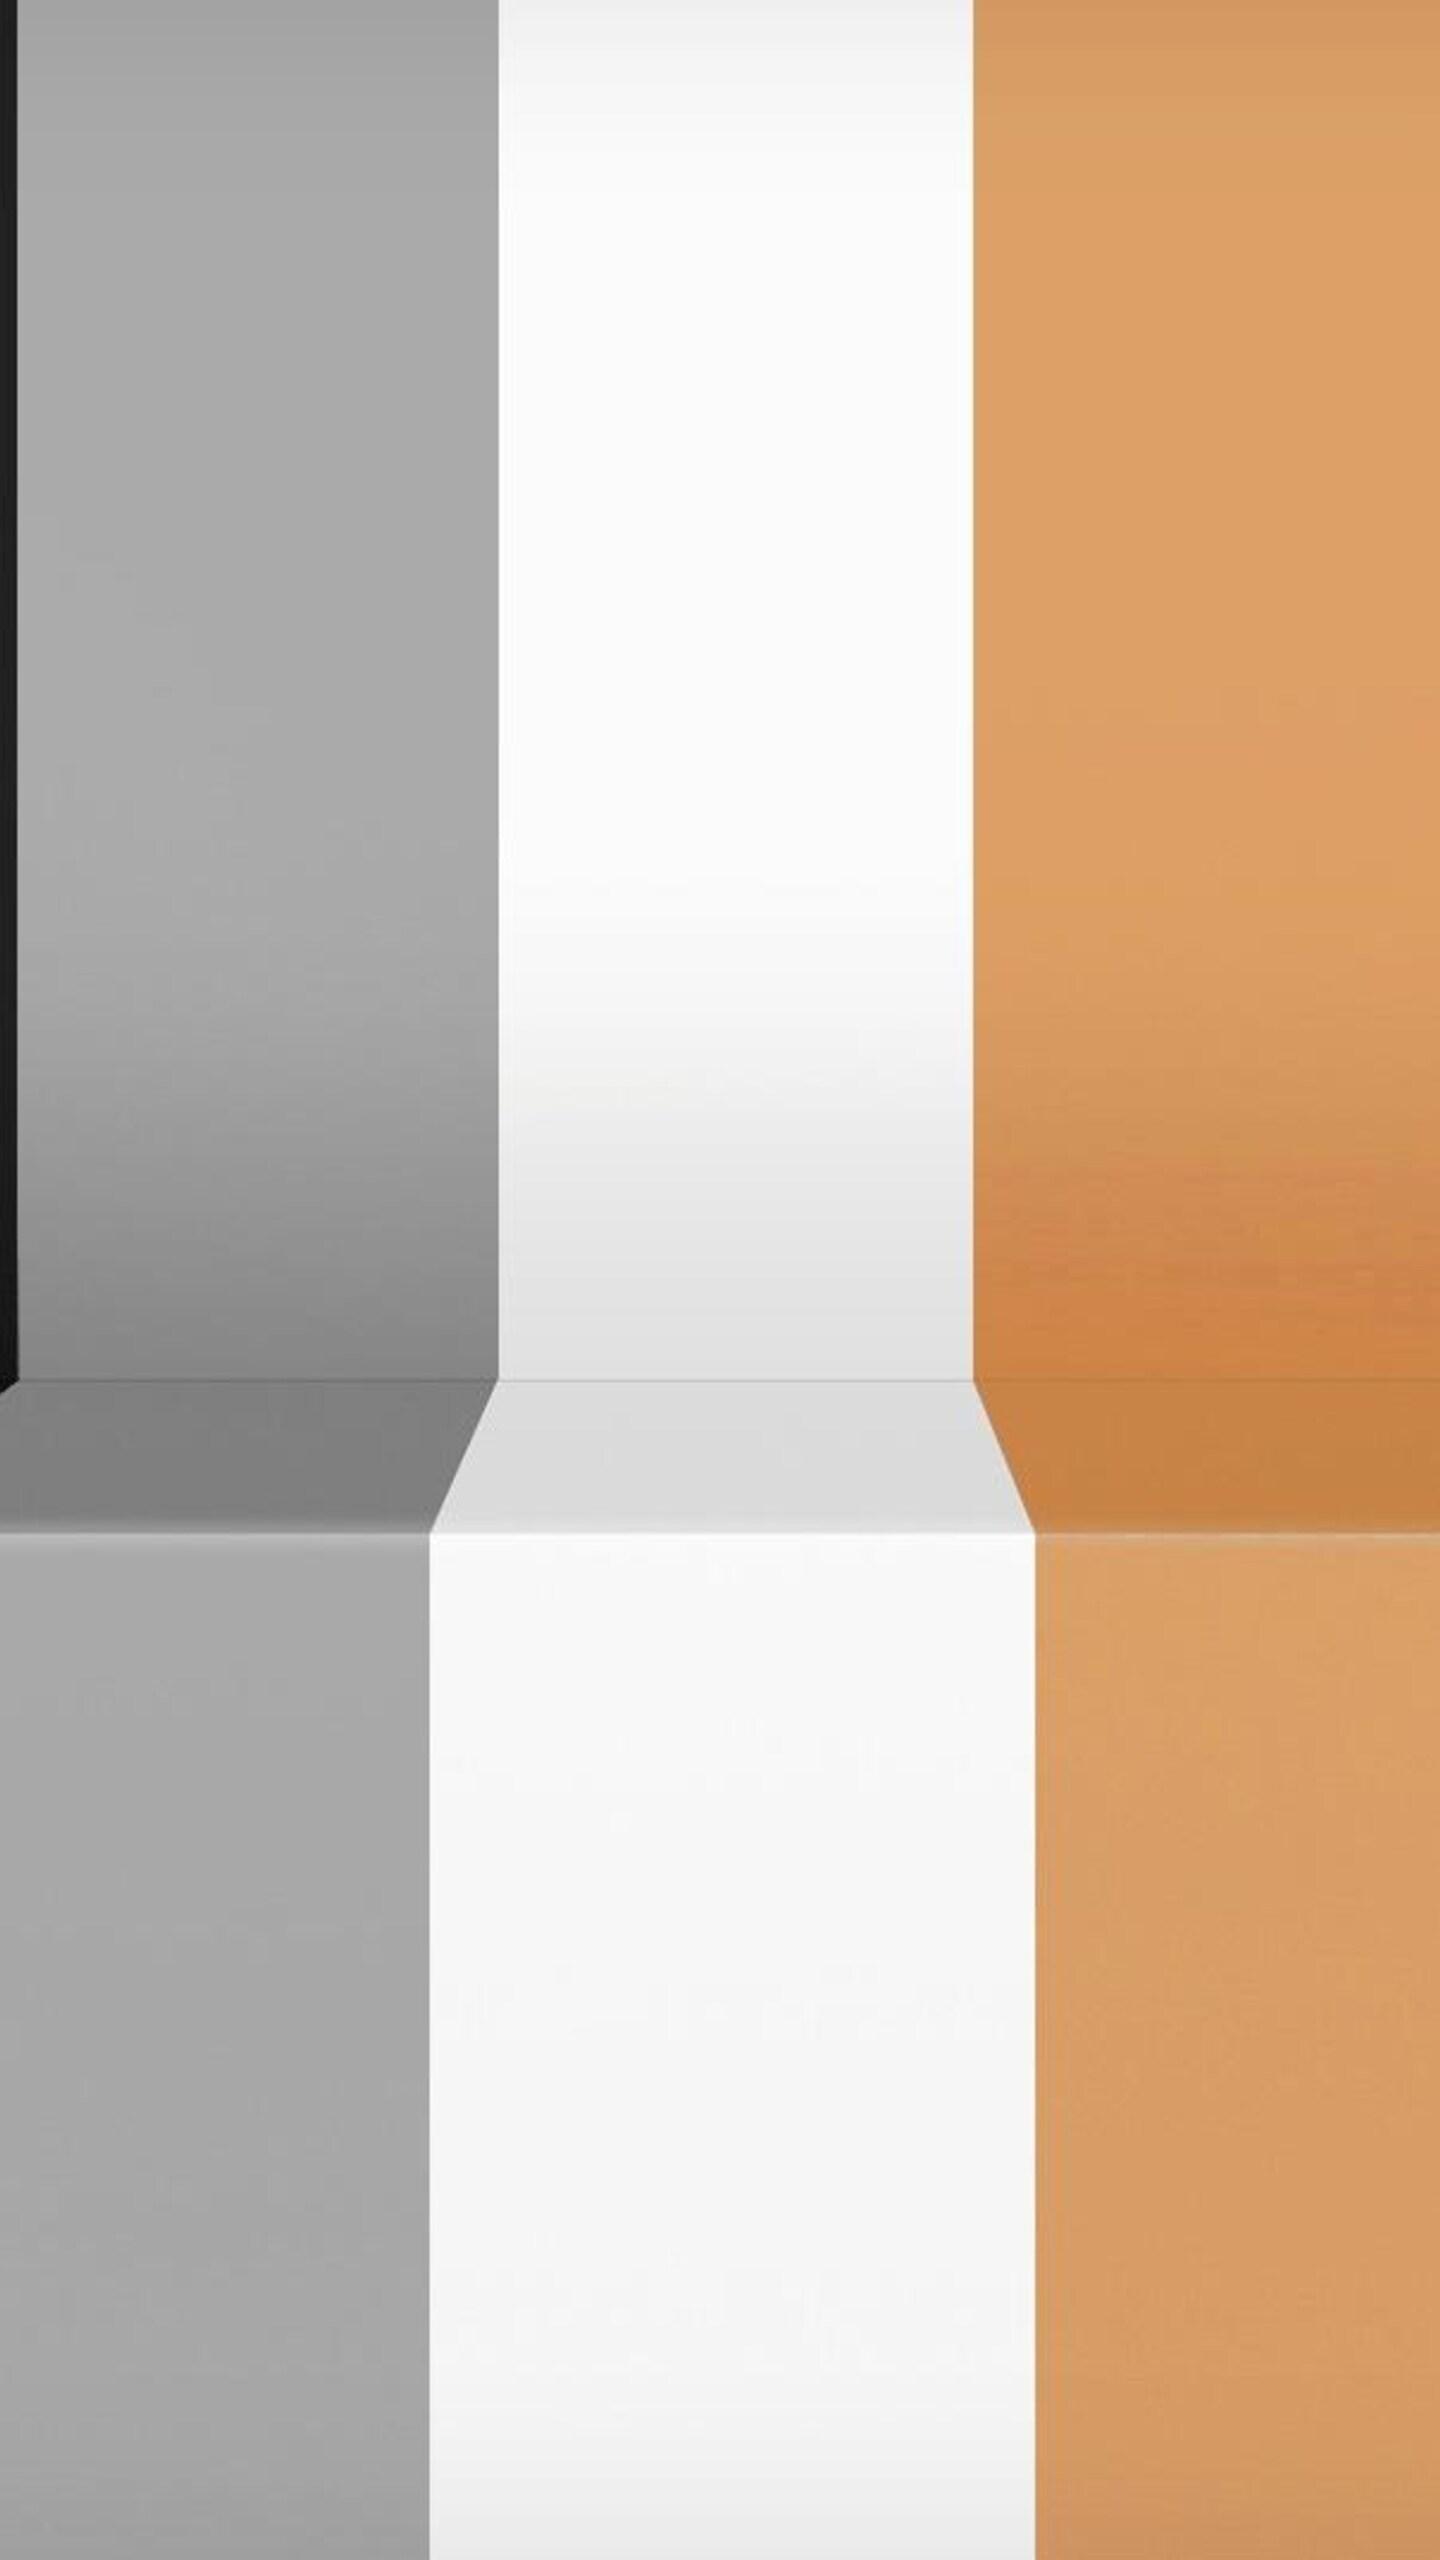 strips-digital-art.jpg